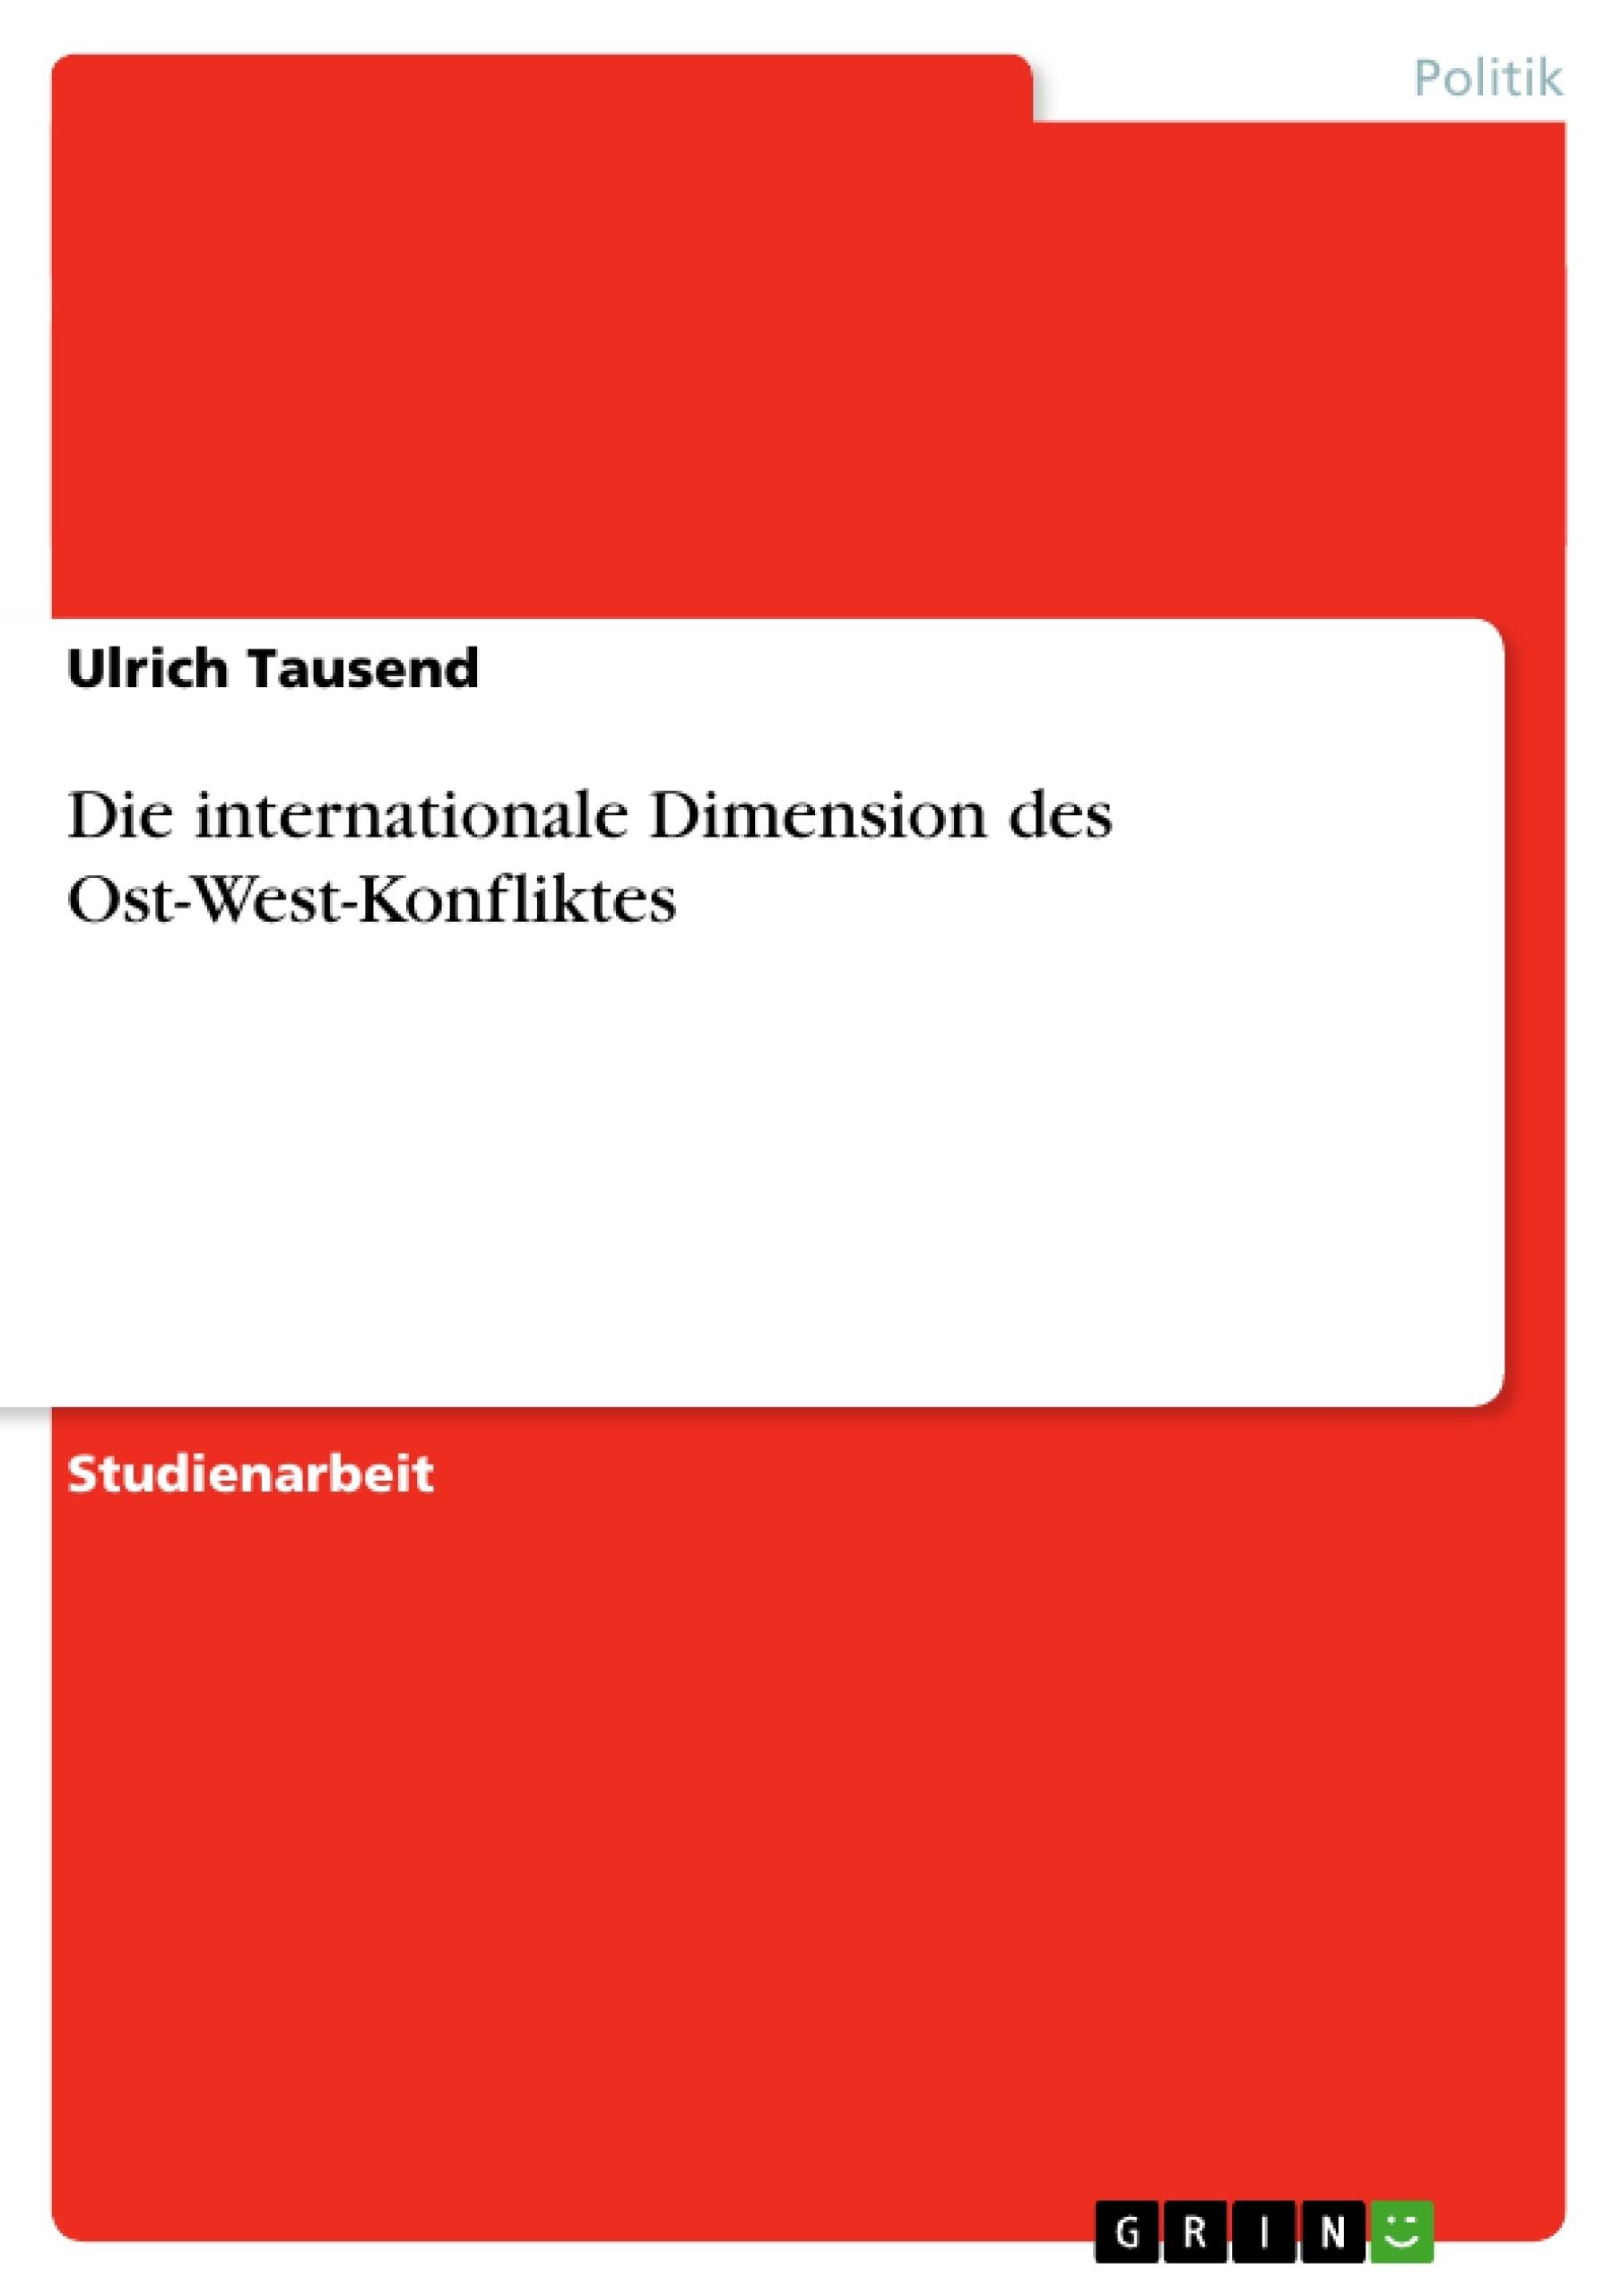 Titel: Die internationale Dimension des Ost-West-Konfliktes